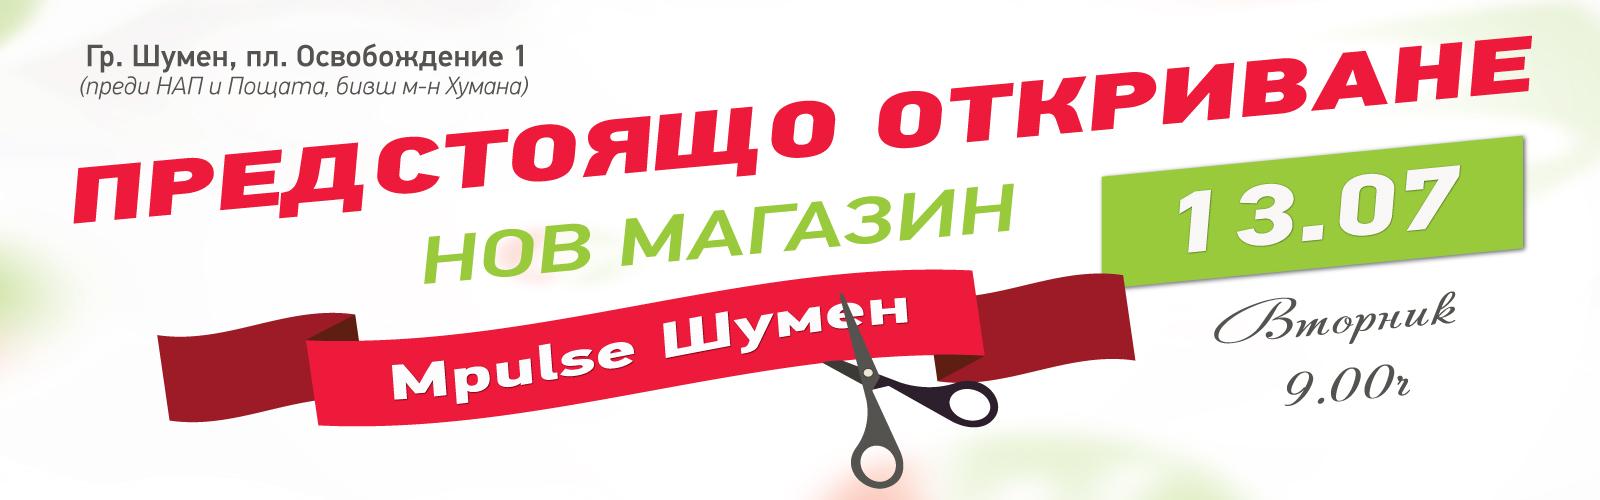 Нов магазин Mpulse Шумен